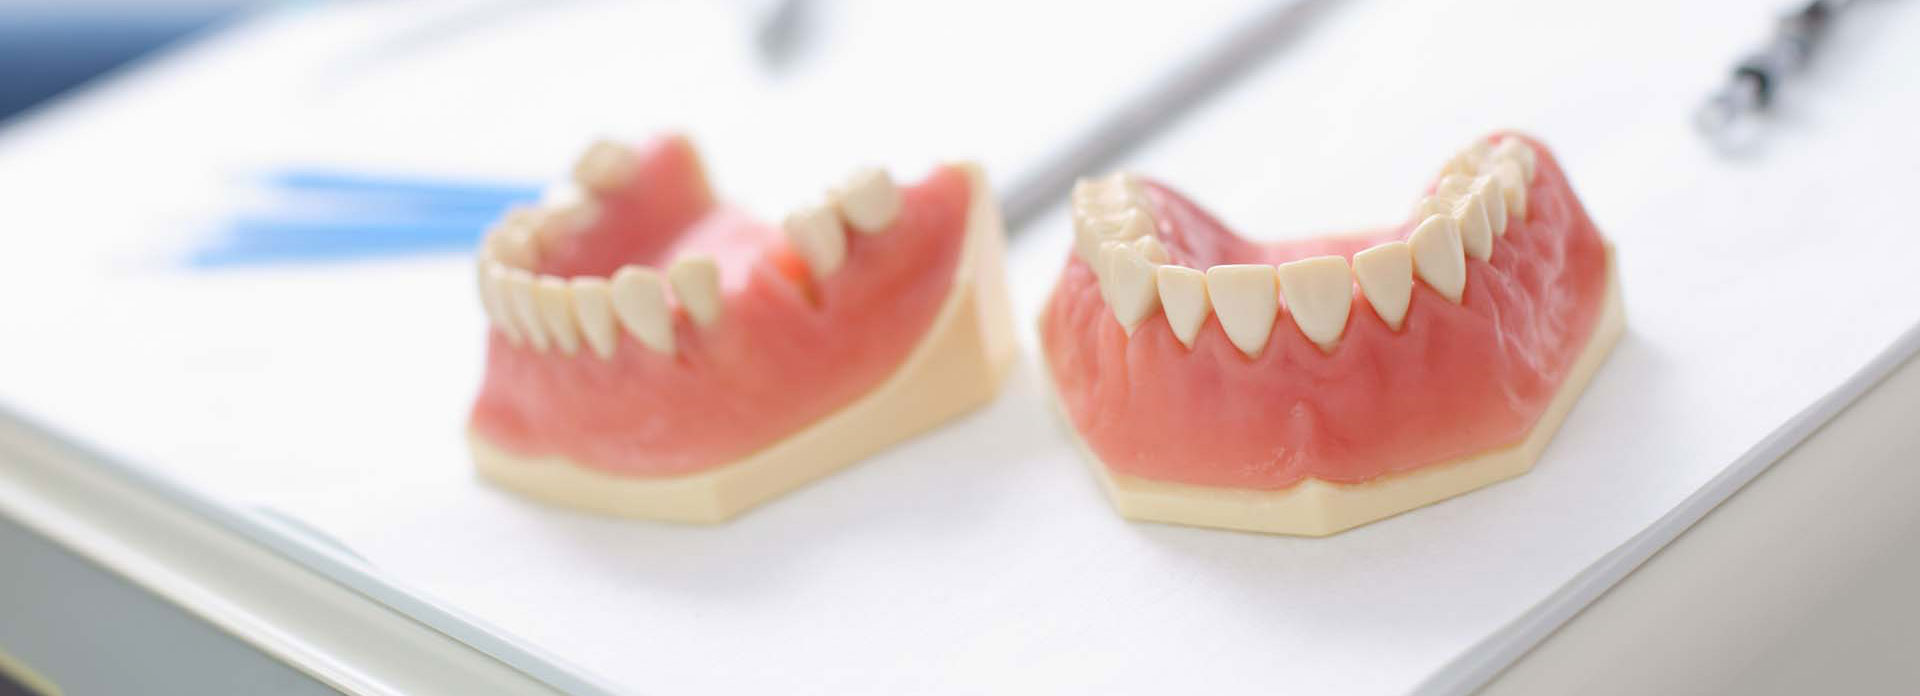 Dental jaw model on a dentist table